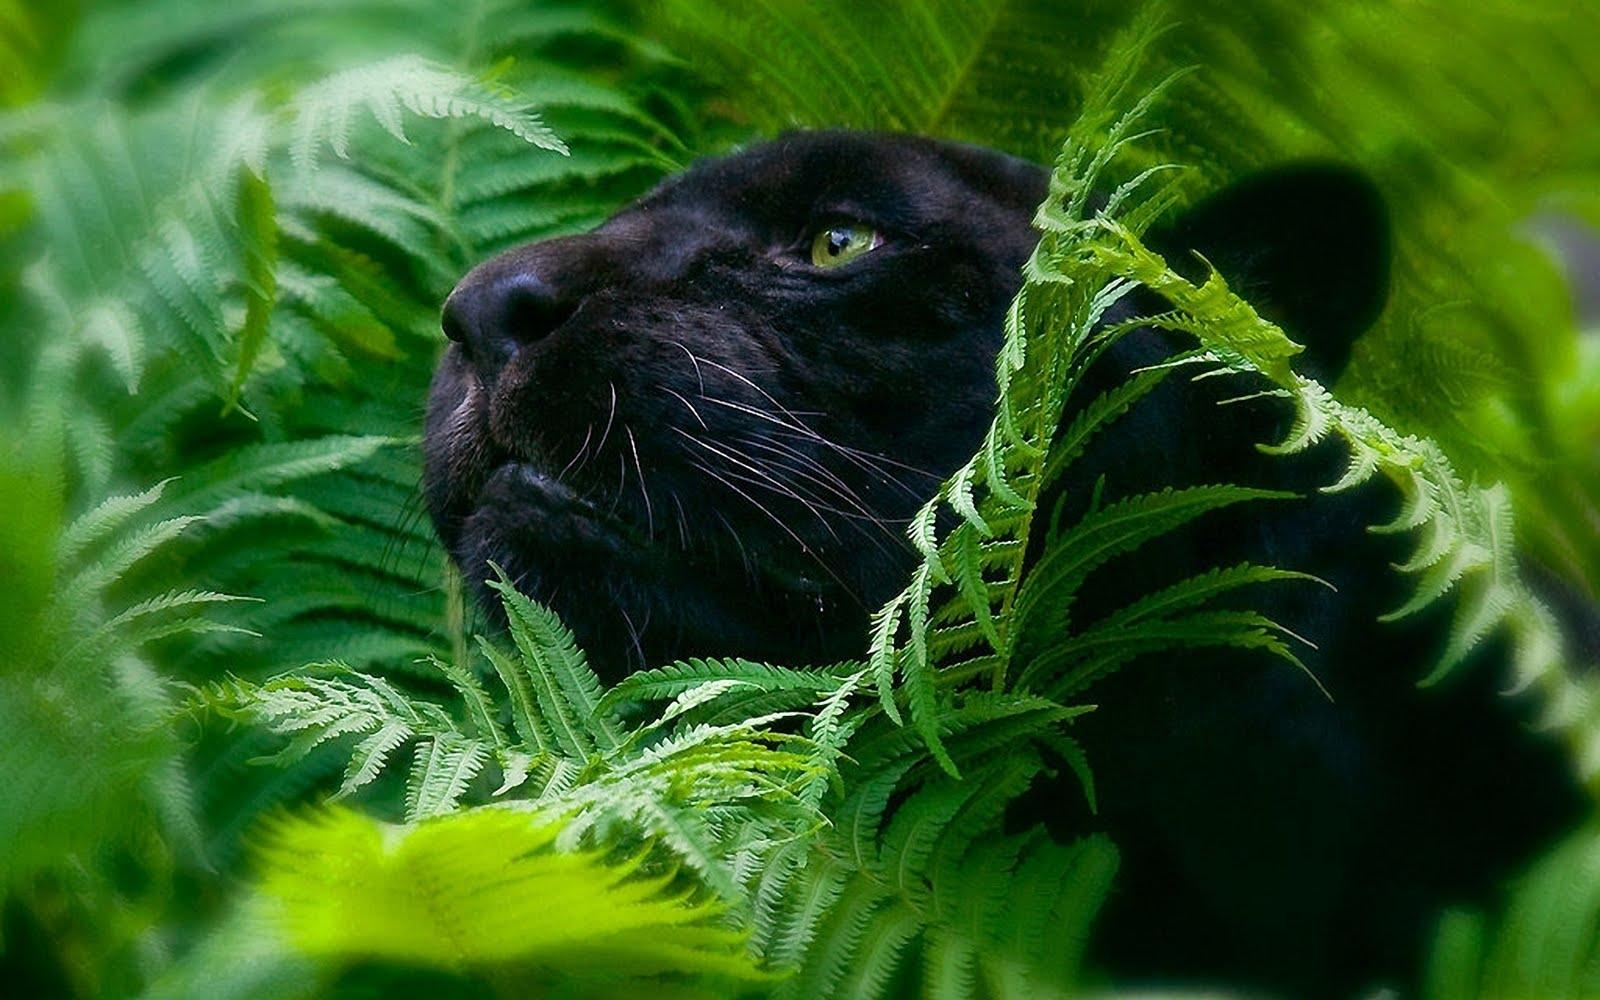 Black Panther Animal 4k Wallpapers For Mobile: IMAGENES ANIMALES EN ALTA DEFINICION: Mayo 2013